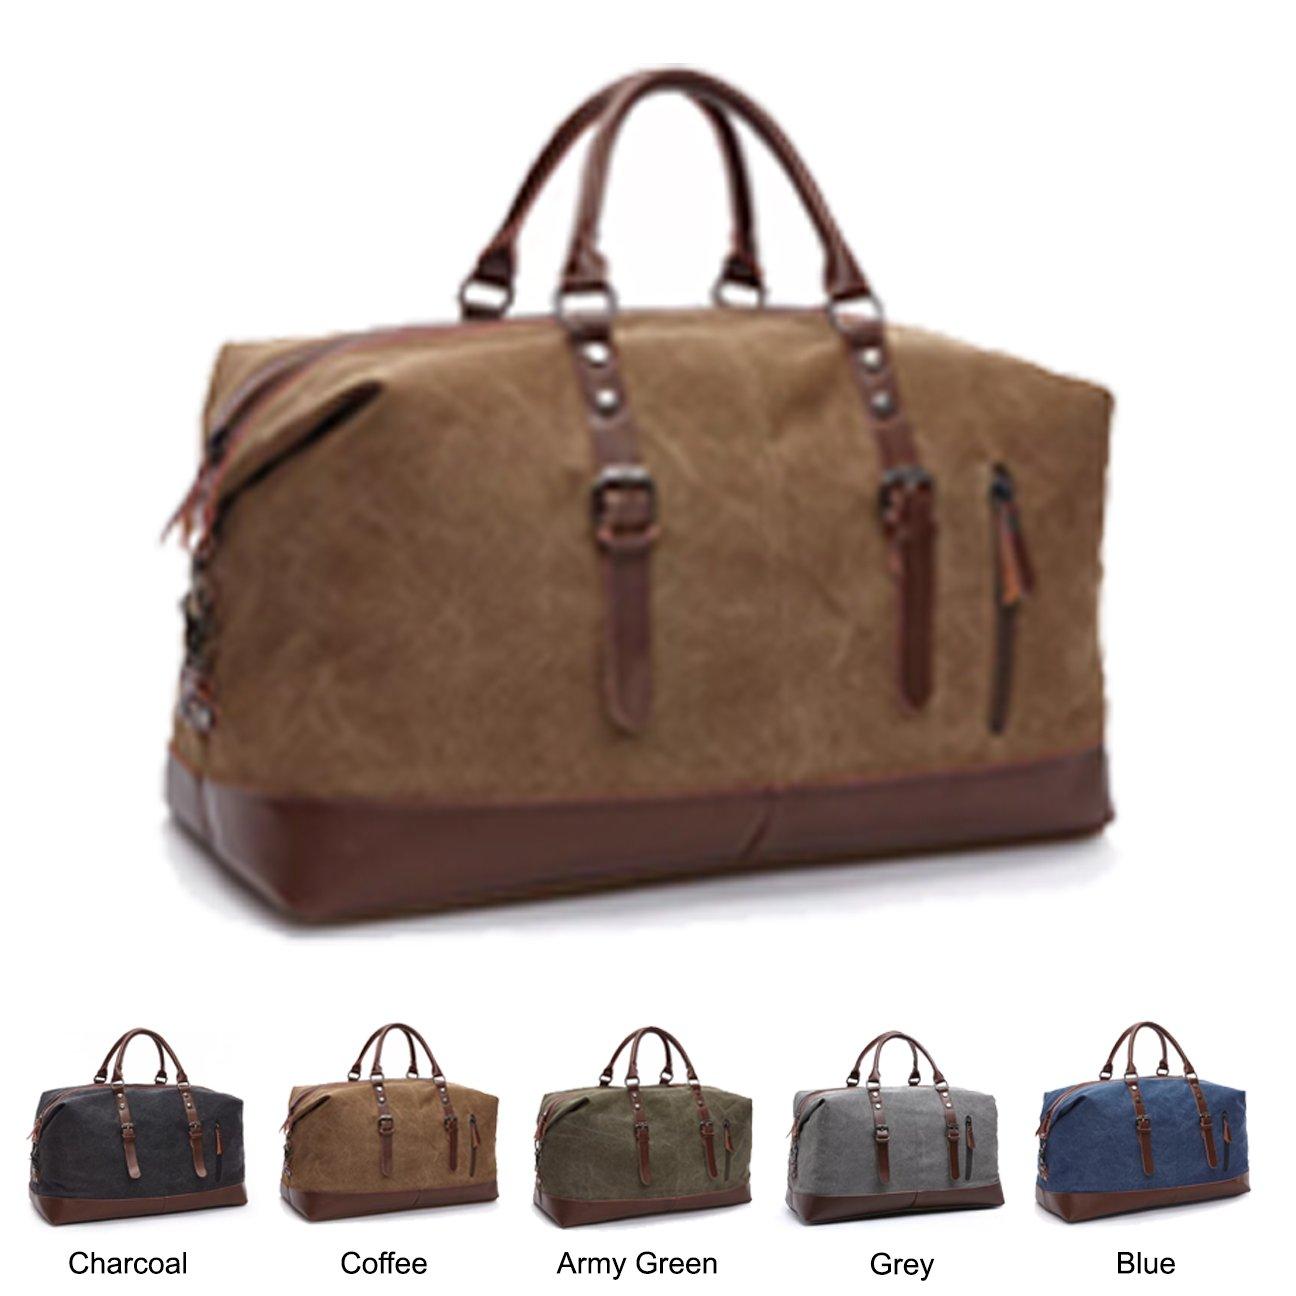 Queenie - Large Unisex Canvas Overnight Travel Tote Luggage Weekend Duffel Bag Shoulder Bag Gym Bag (Model 8655 Coffee)